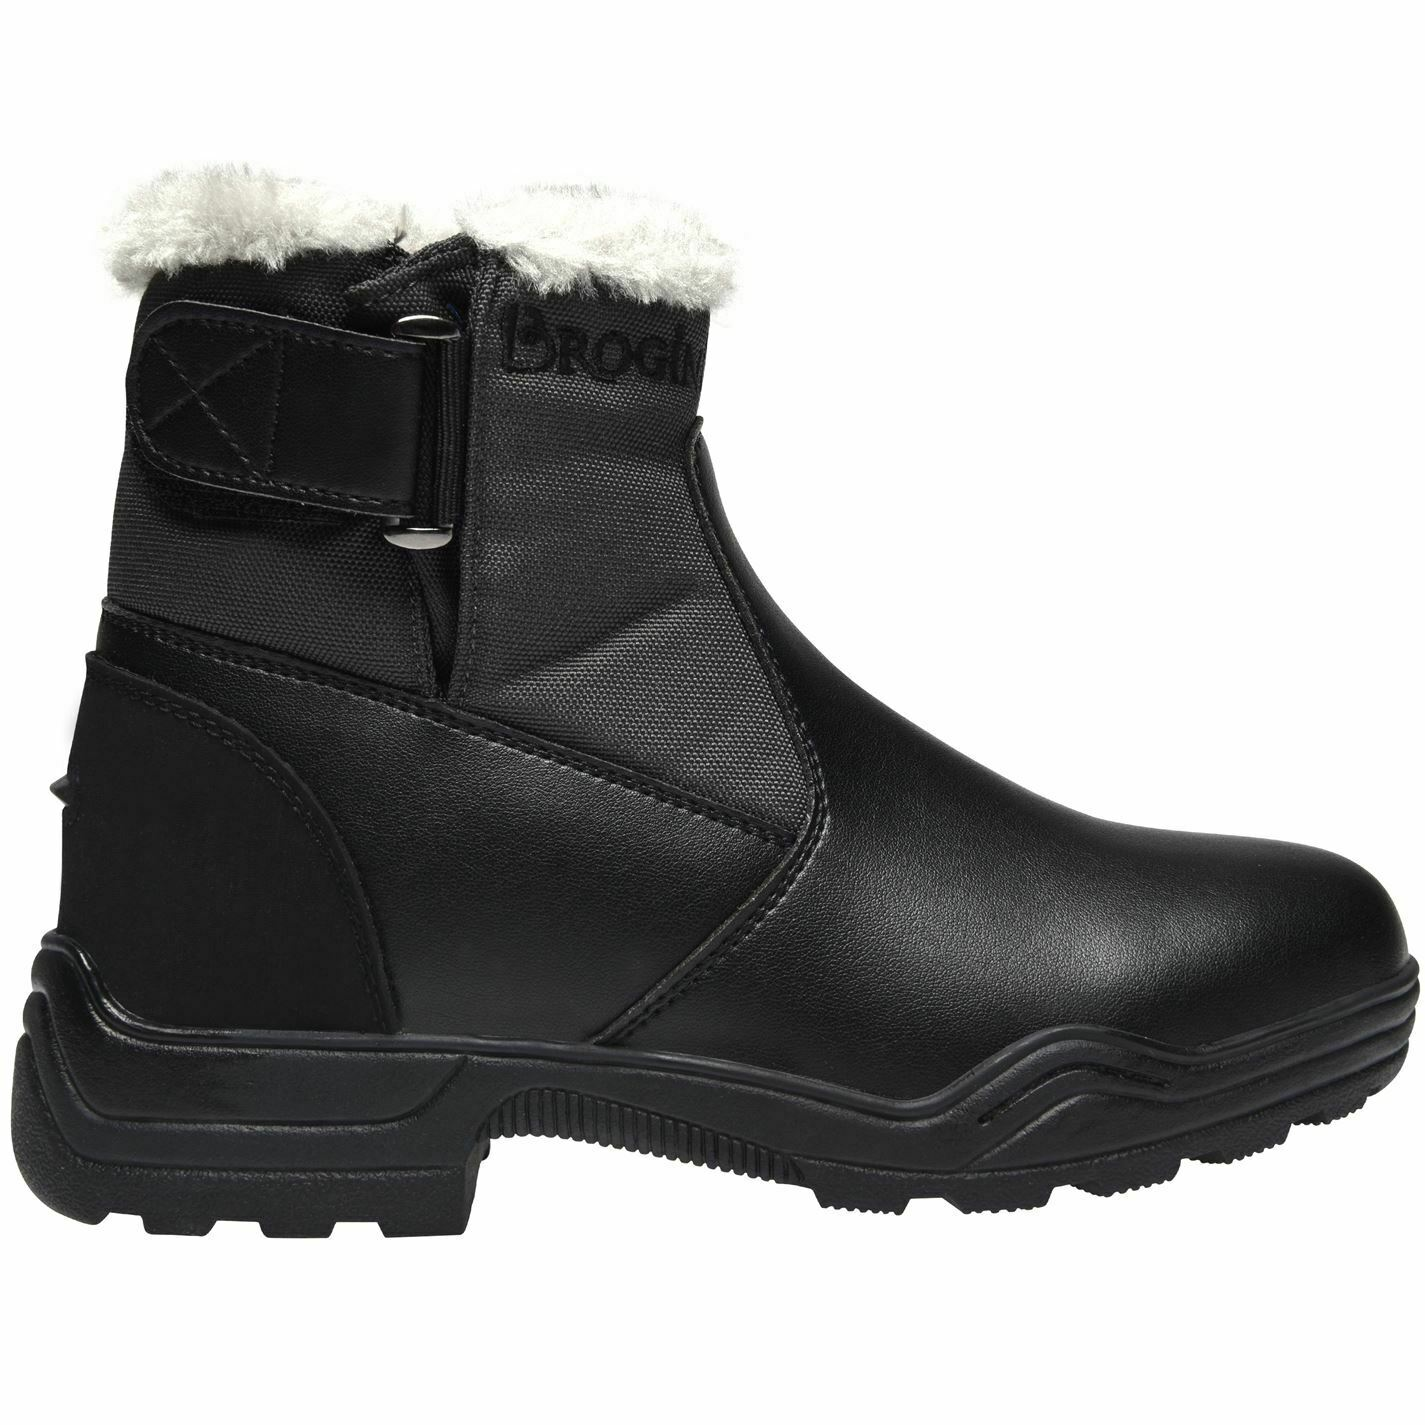 Brogini Womannens Footwear Yard laarzen toevallig Winter Warme Leer